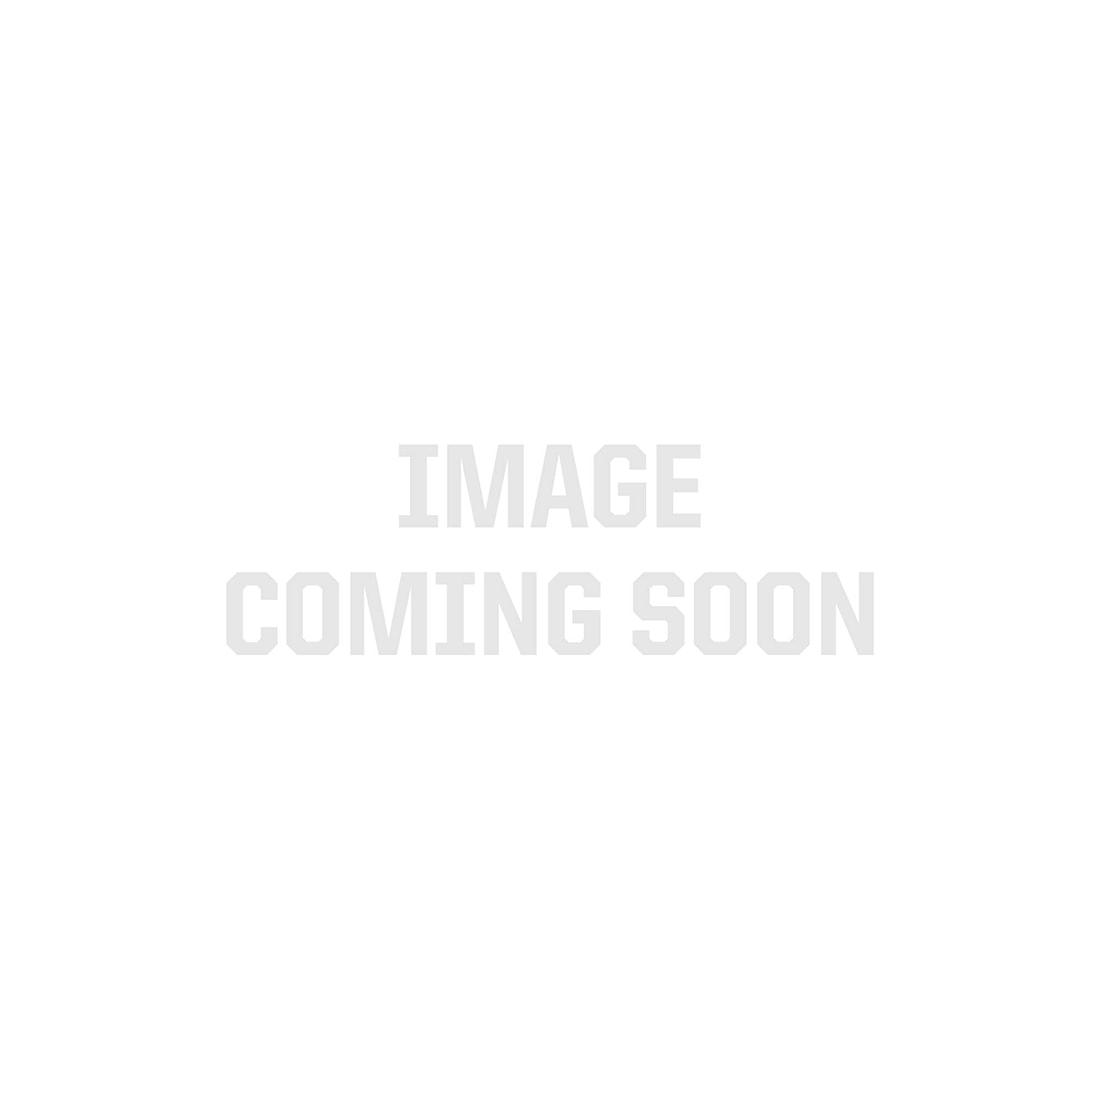 Universal Dimming Driver - 24 VDC - 60W